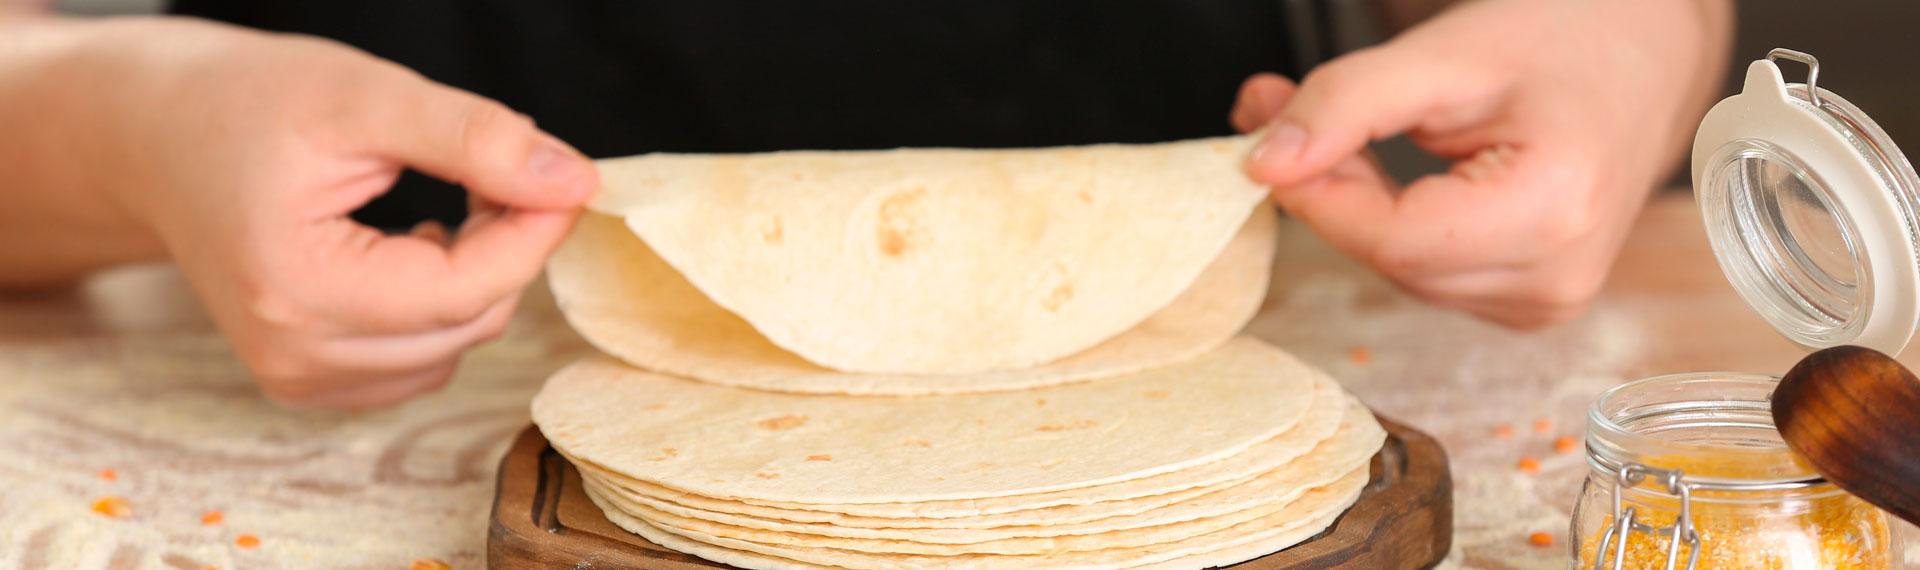 Harinera Guadalupe Crepa Fesa